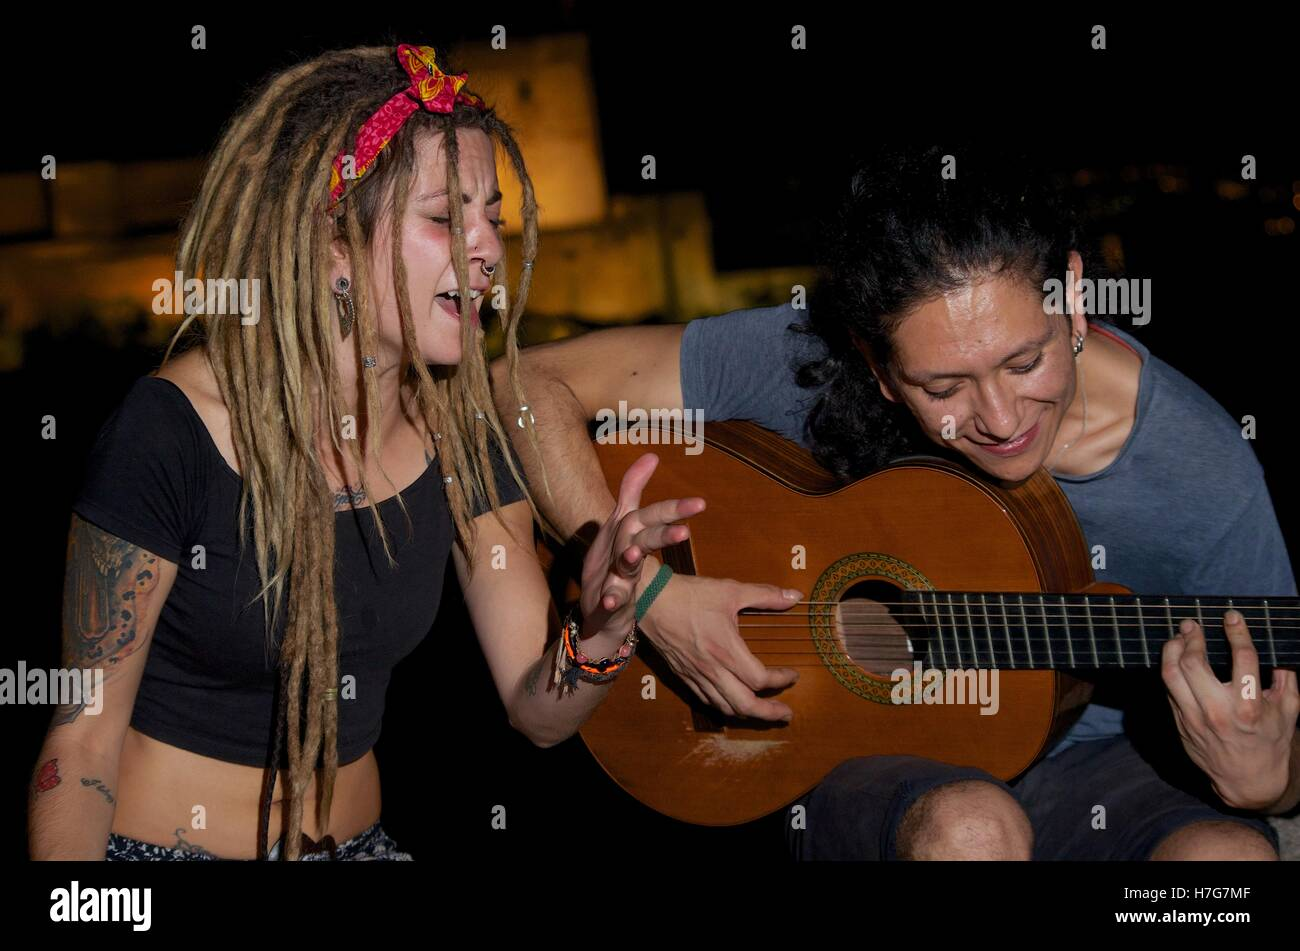 Flamenco singer and guitarist perform in Granada's Albaicin - Stock Image